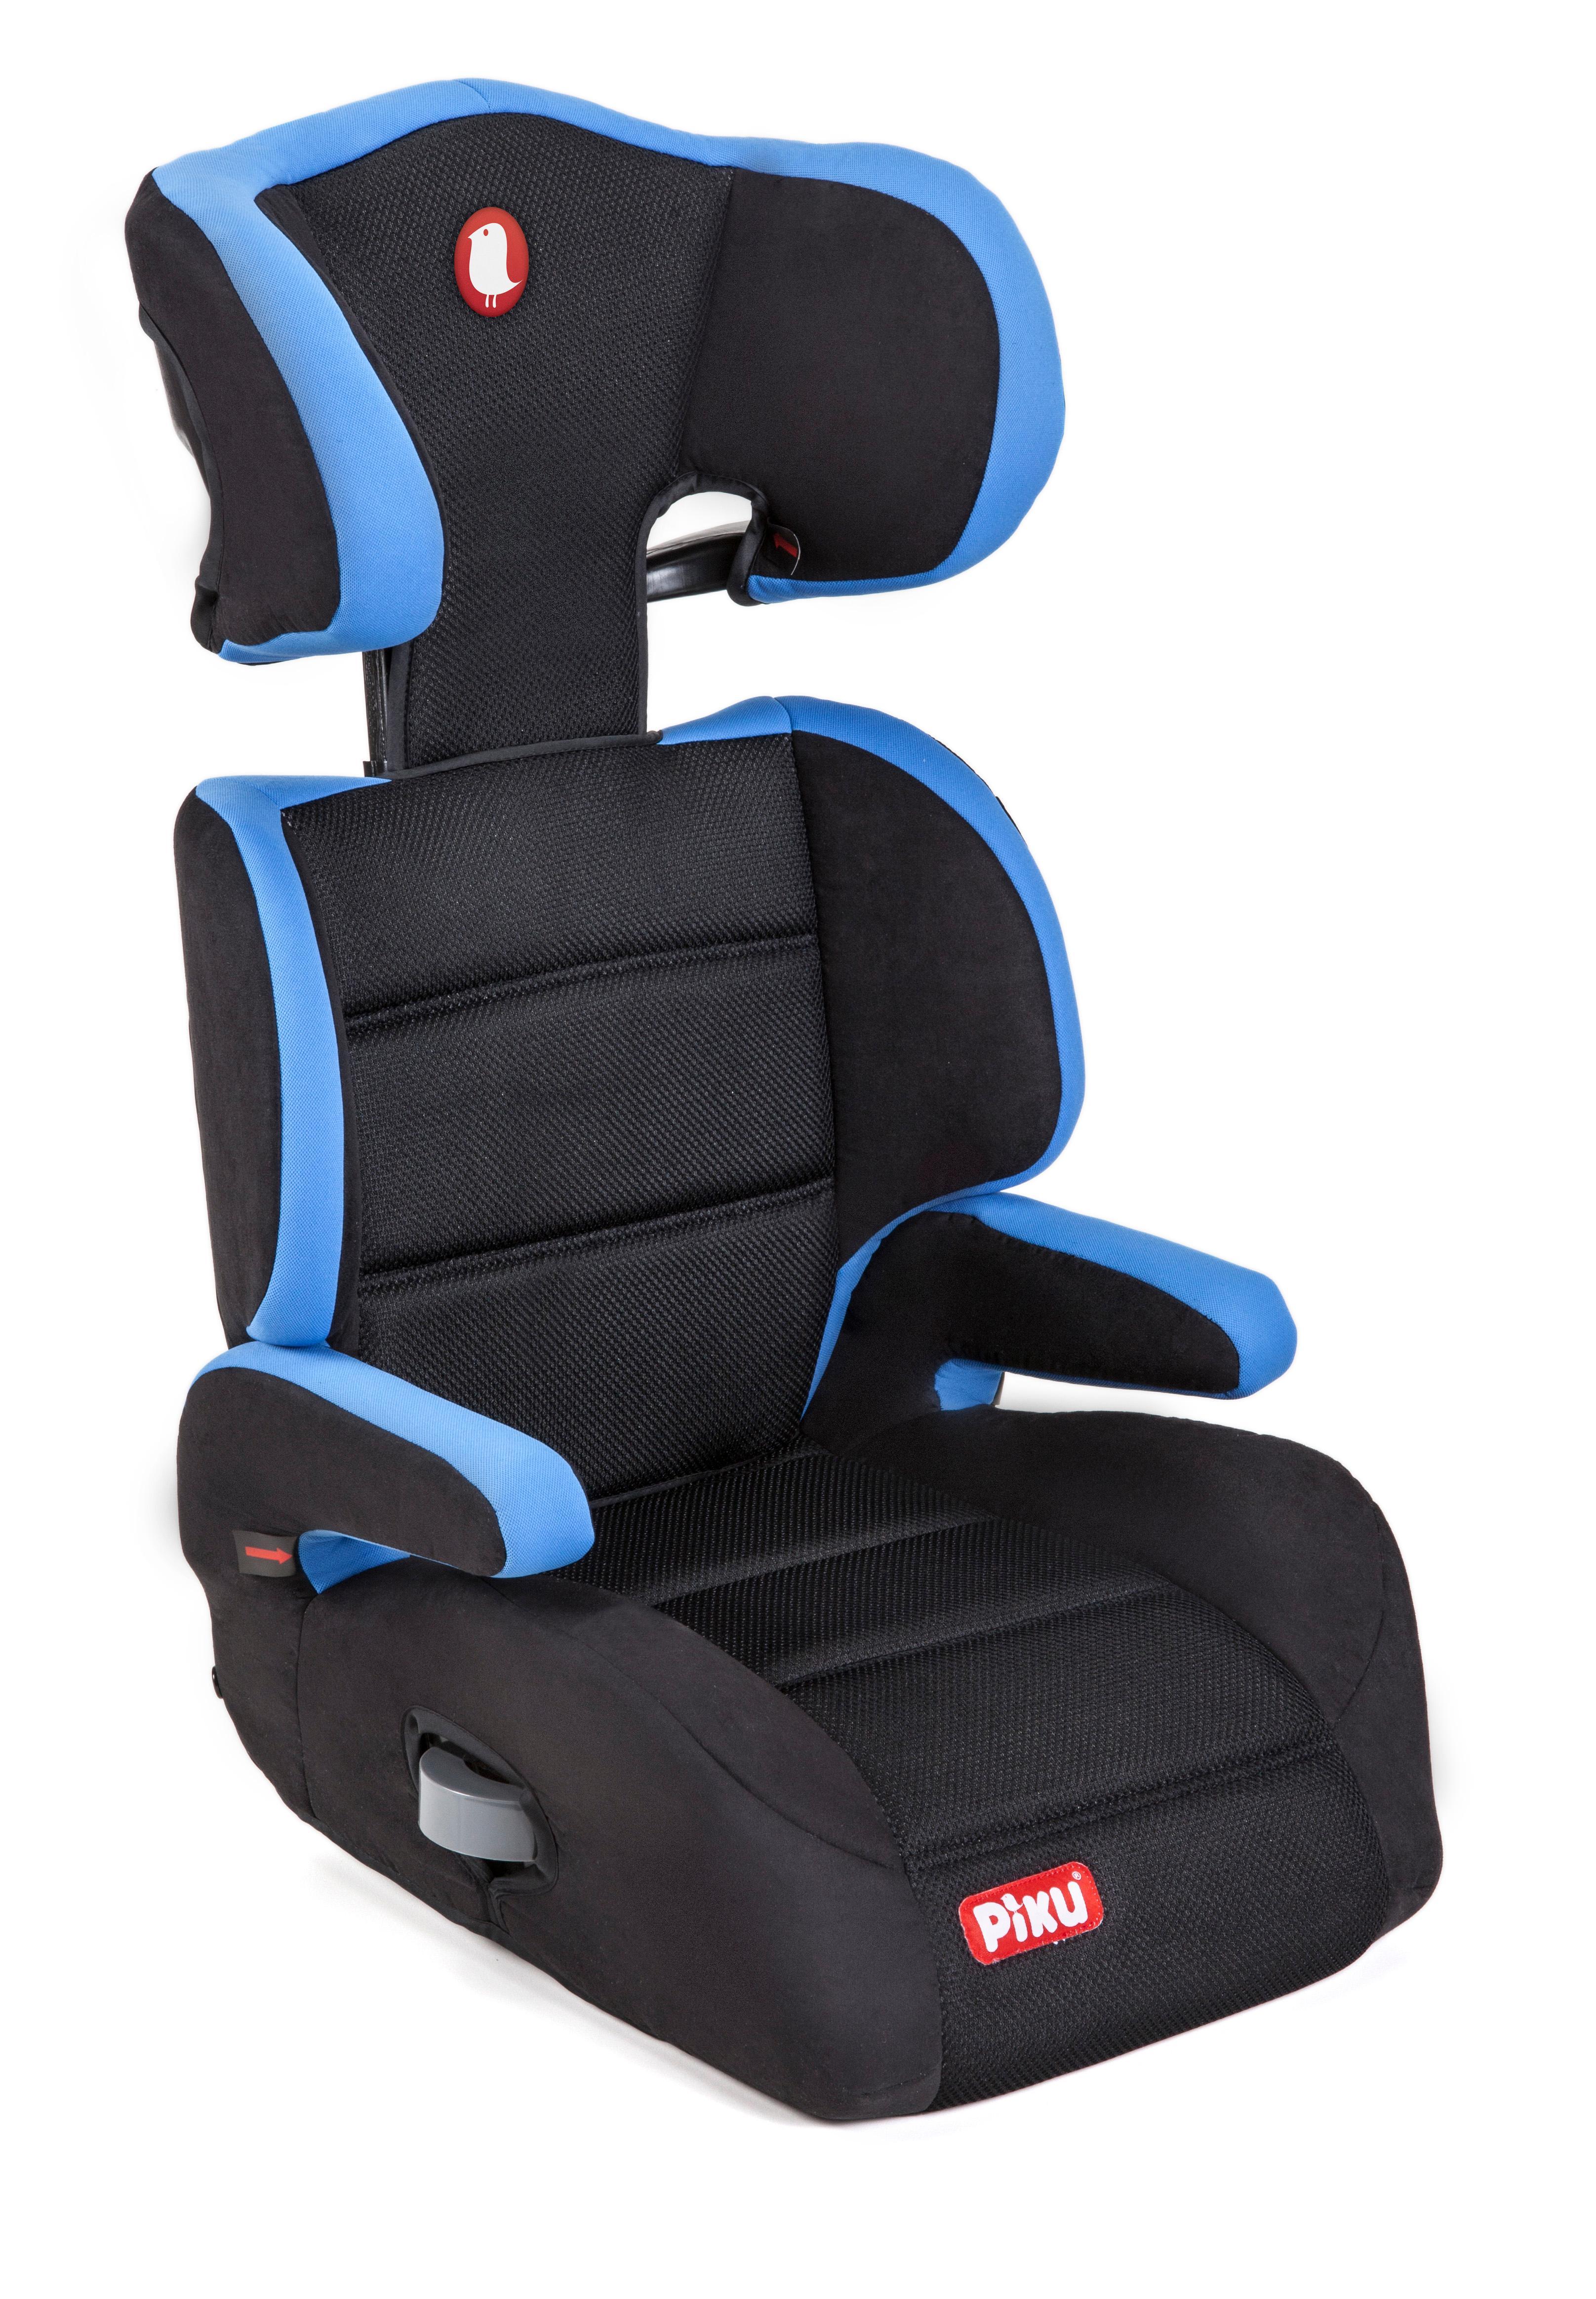 Piku 6227 silla de coche grupo 2 3 15 36 kg 3 12 a os for Silla coche nino 7 anos